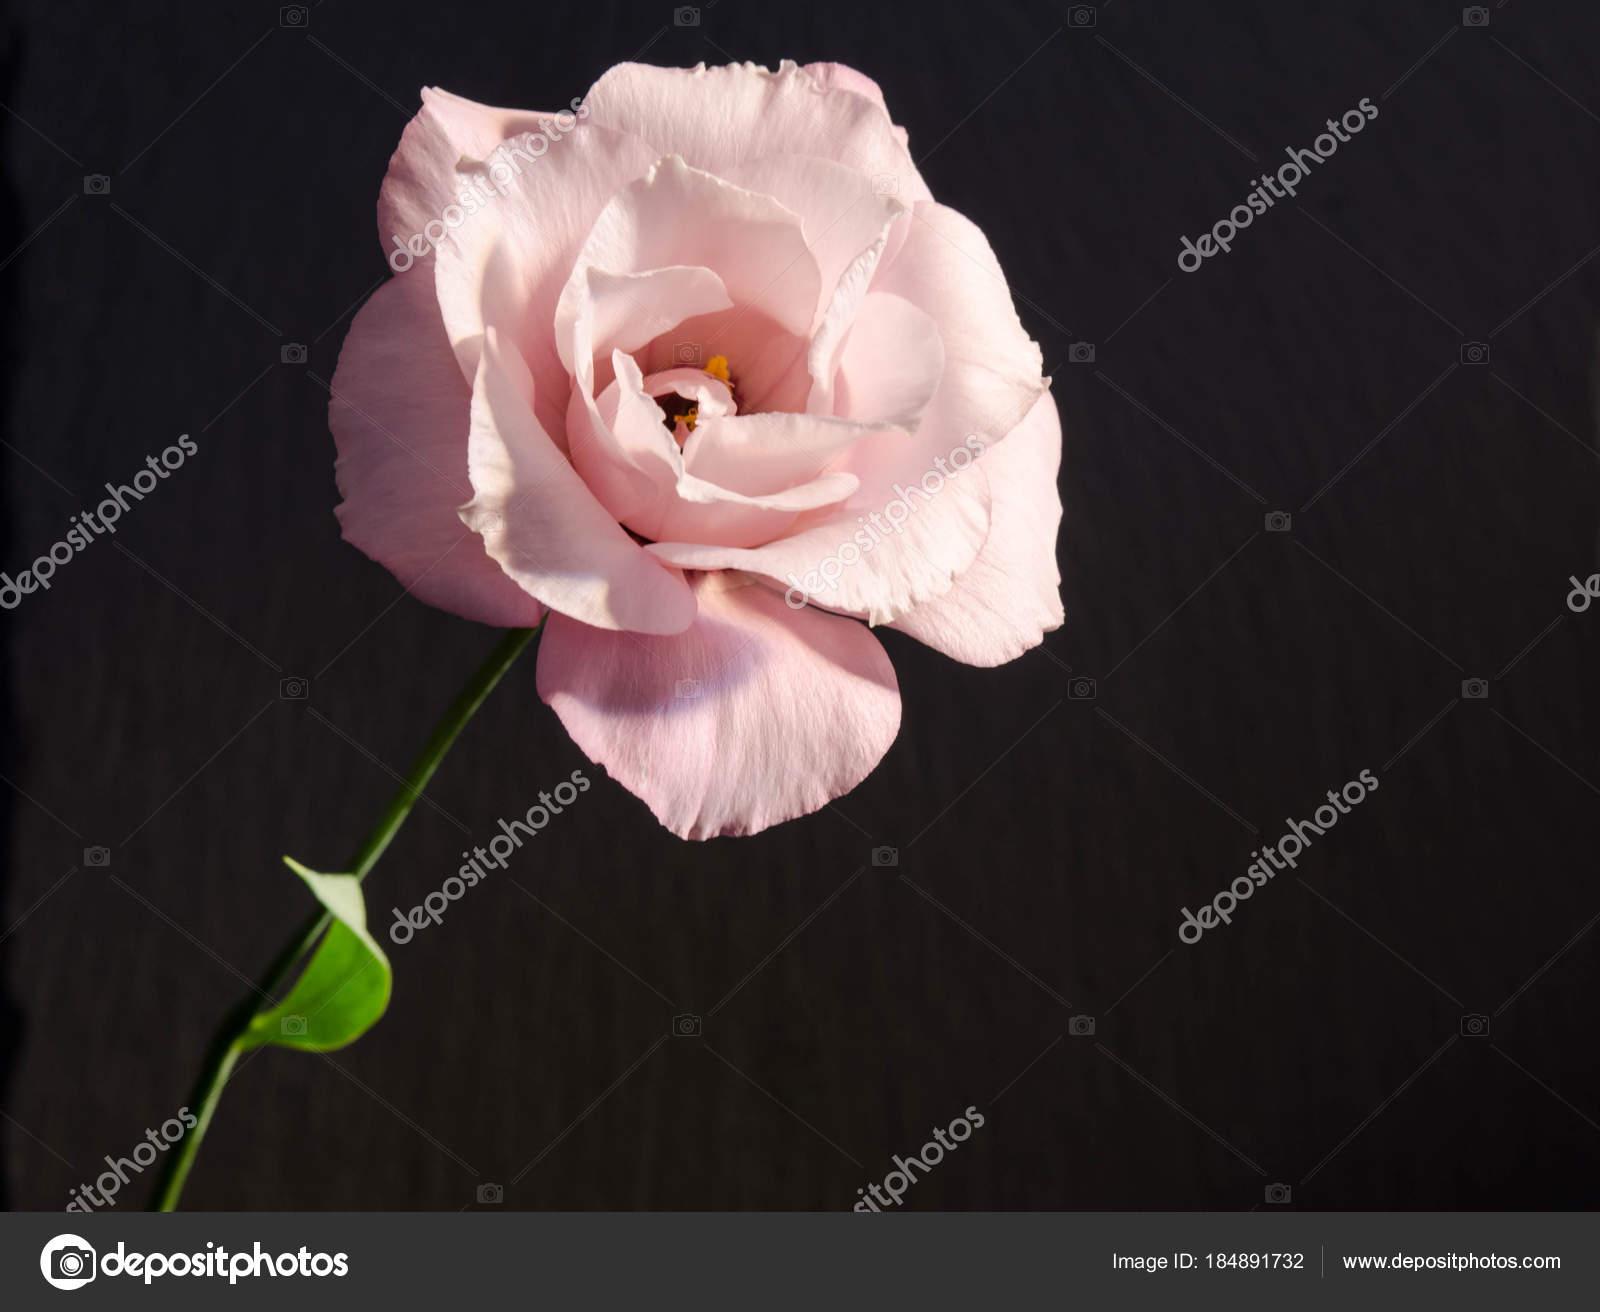 Beautiful Single Eustoma Flower Rose On Dark Background Stock